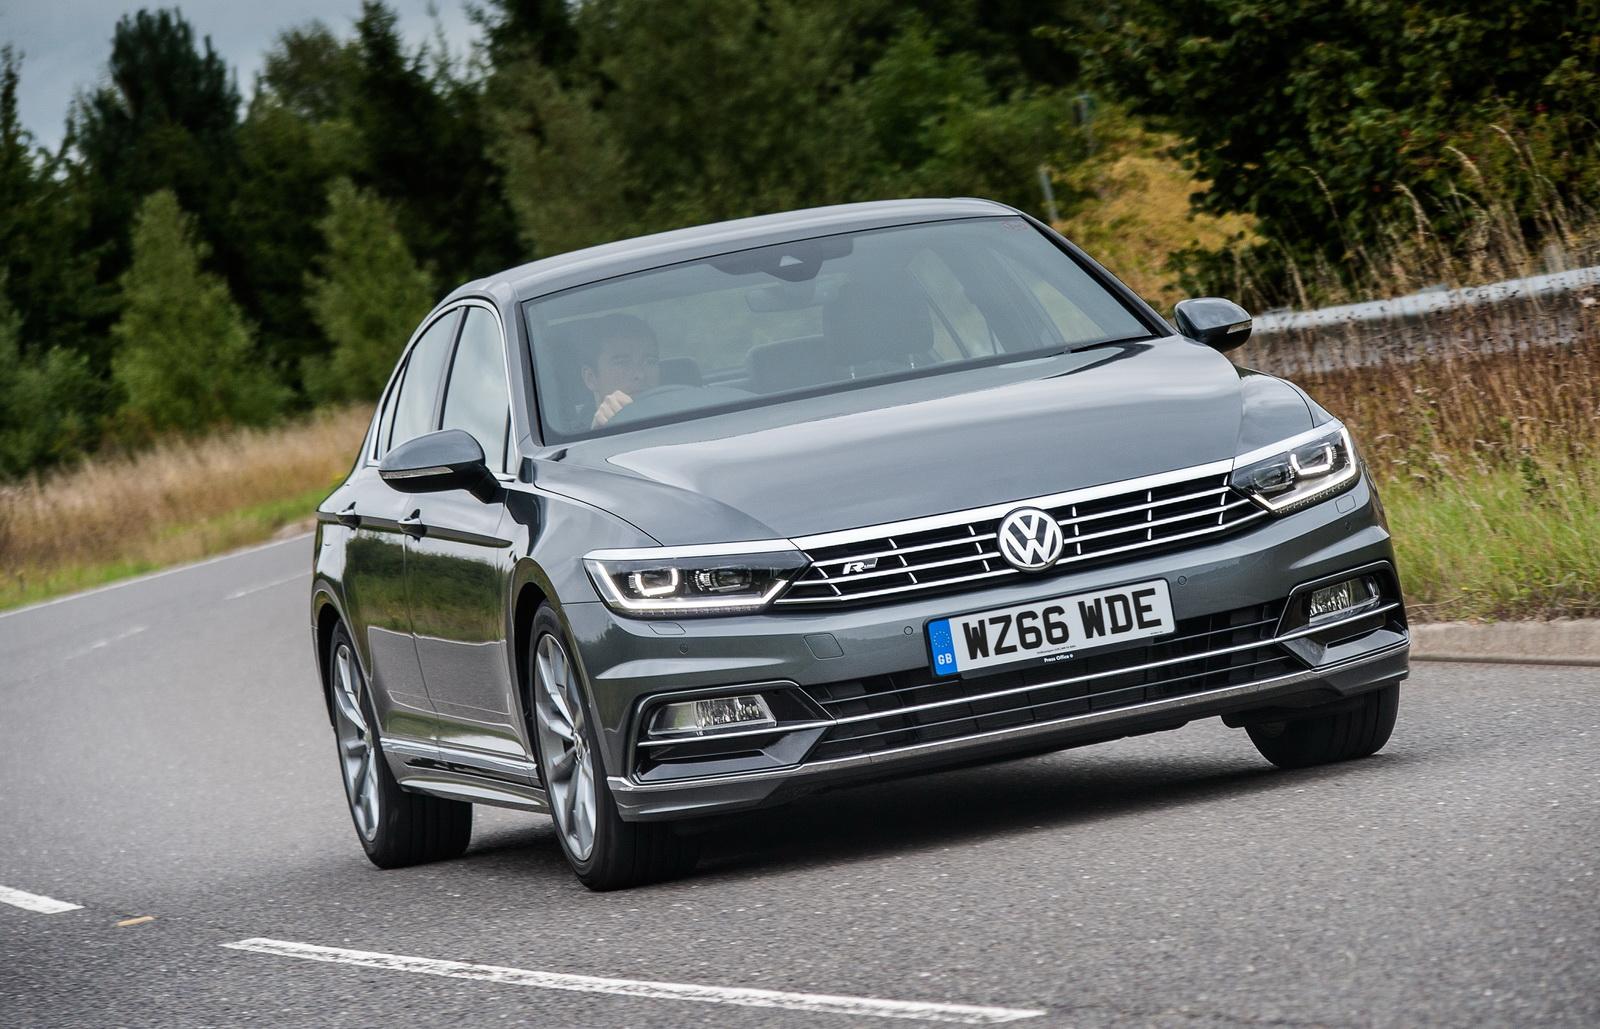 2018 VW Passat Gets More Standard Features 22605